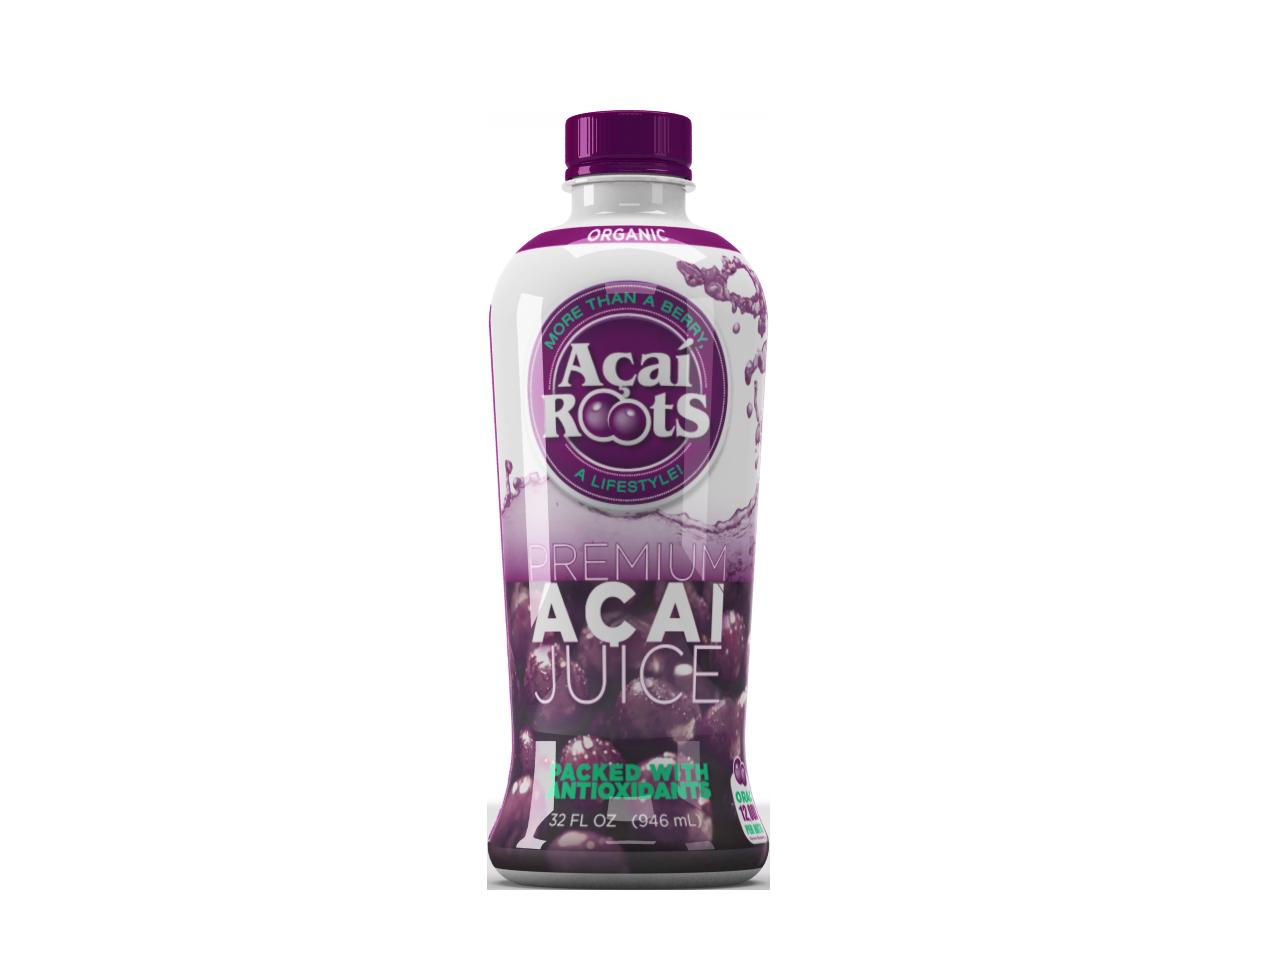 Acai Roots Organic Acai Juice 32oz